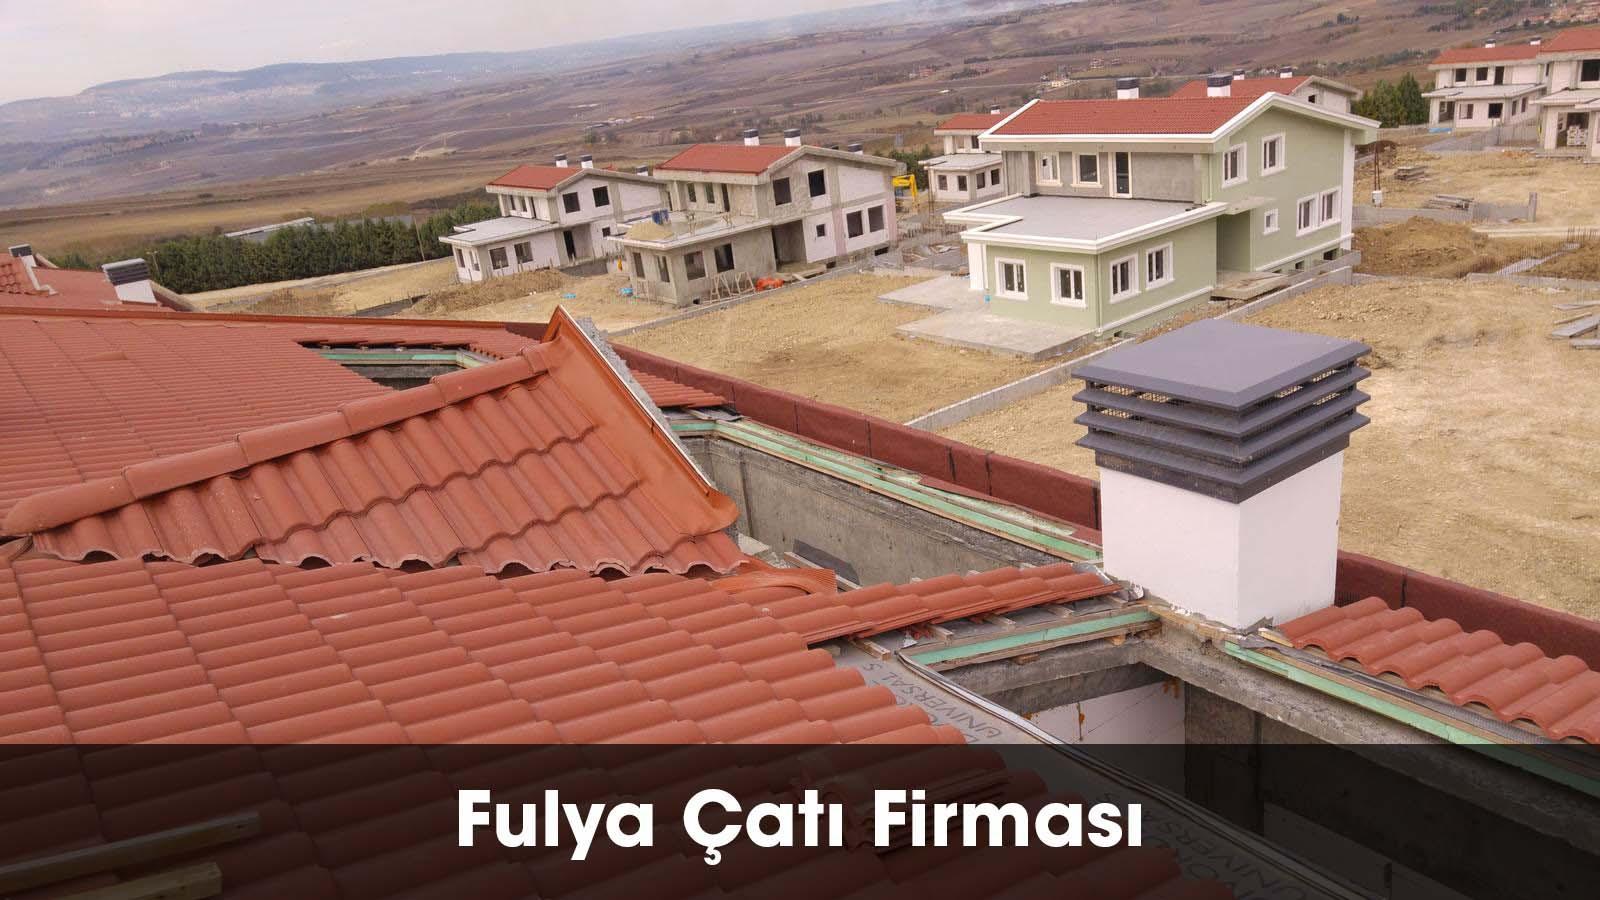 Fulya çatı firması